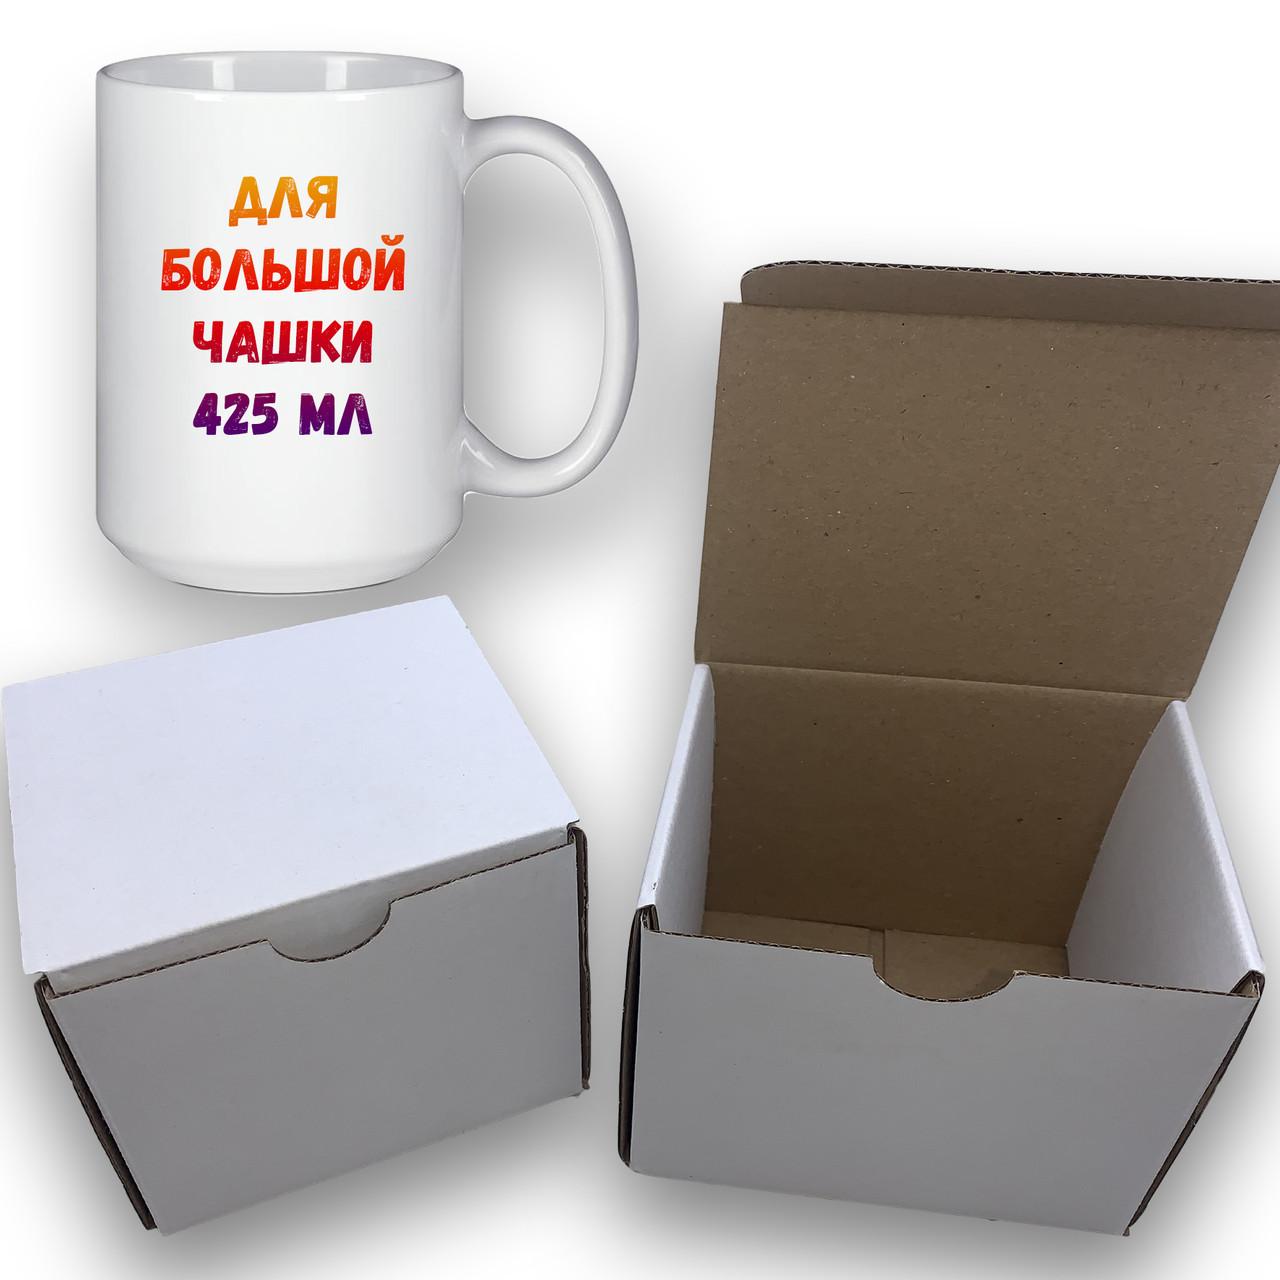 Упаковка белая из картона для чашек 425 мл (NEW)